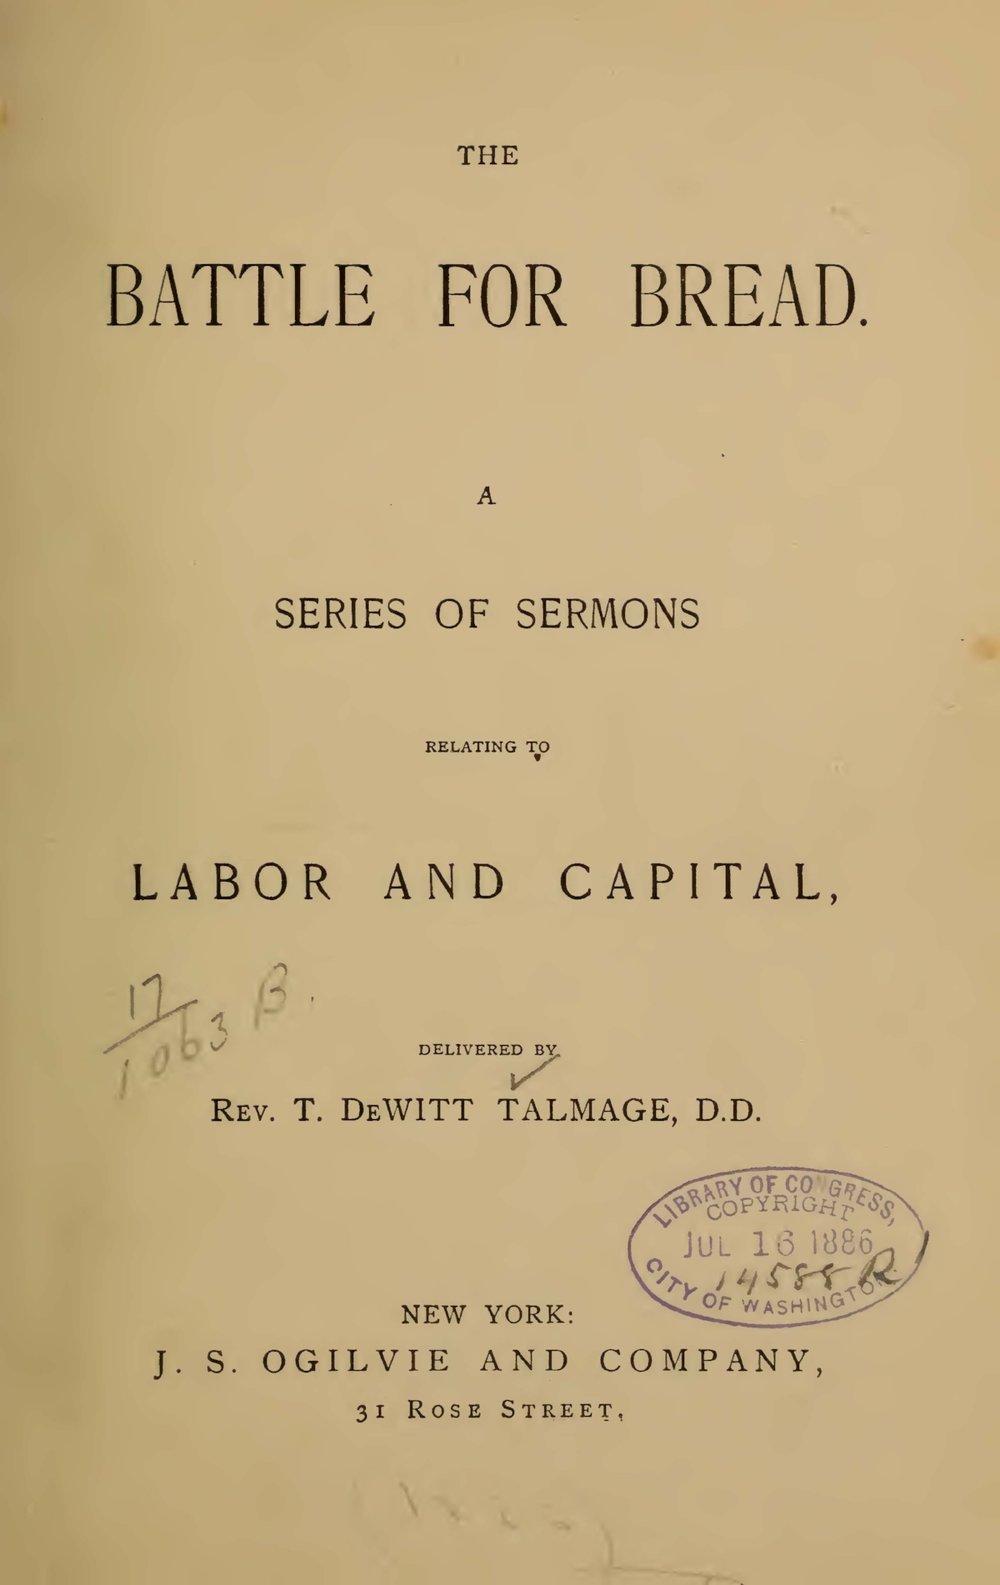 Talmage, Thomas De Witt, The Battle for Bread Title Page.jpg